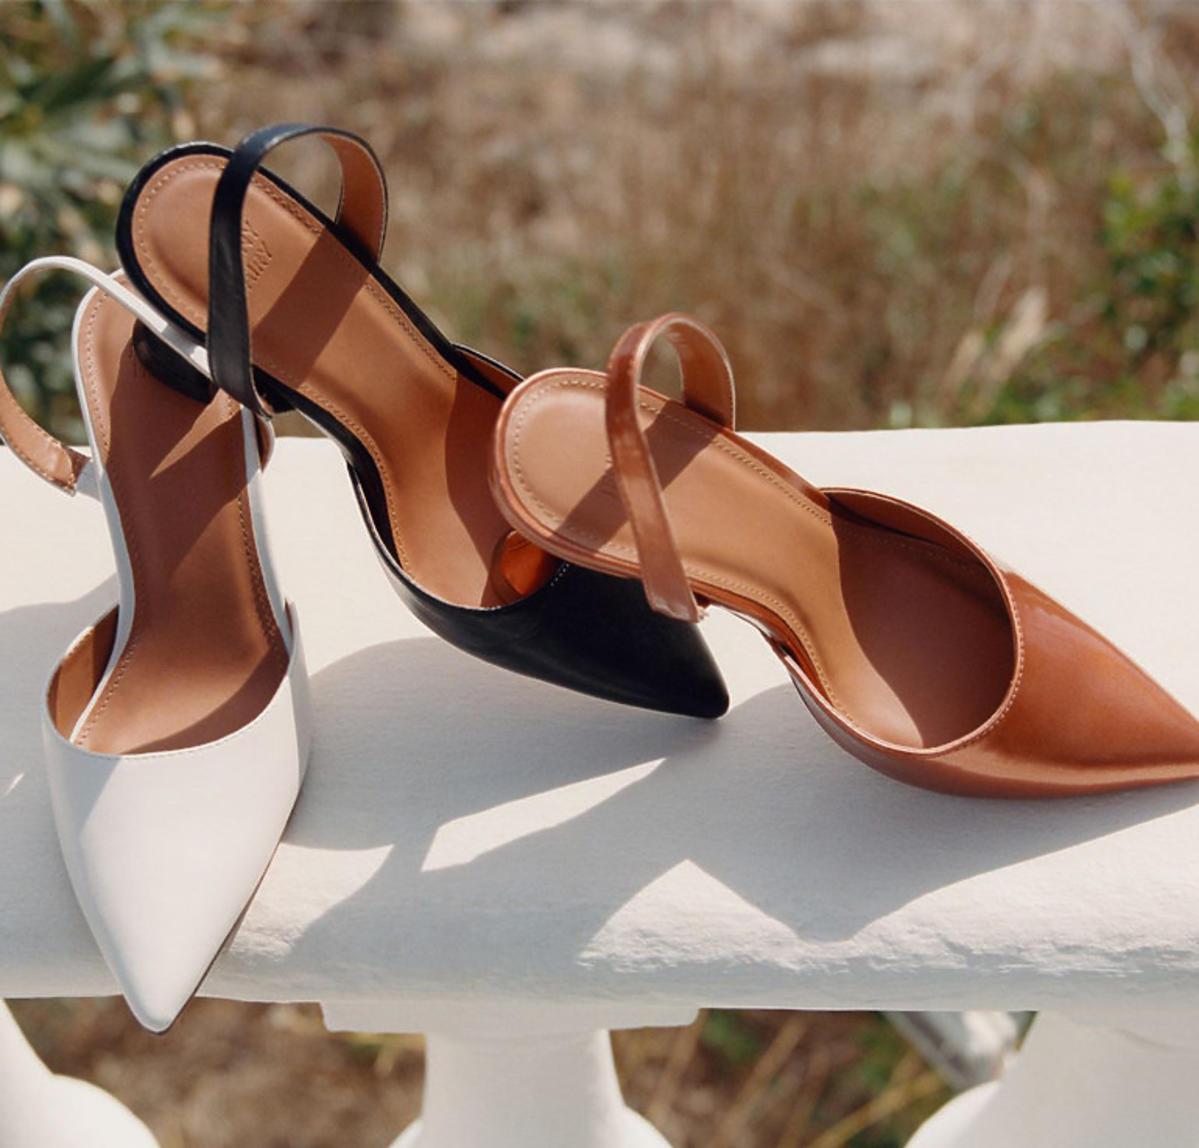 Modelki prezentujące buty Jenny Fairy